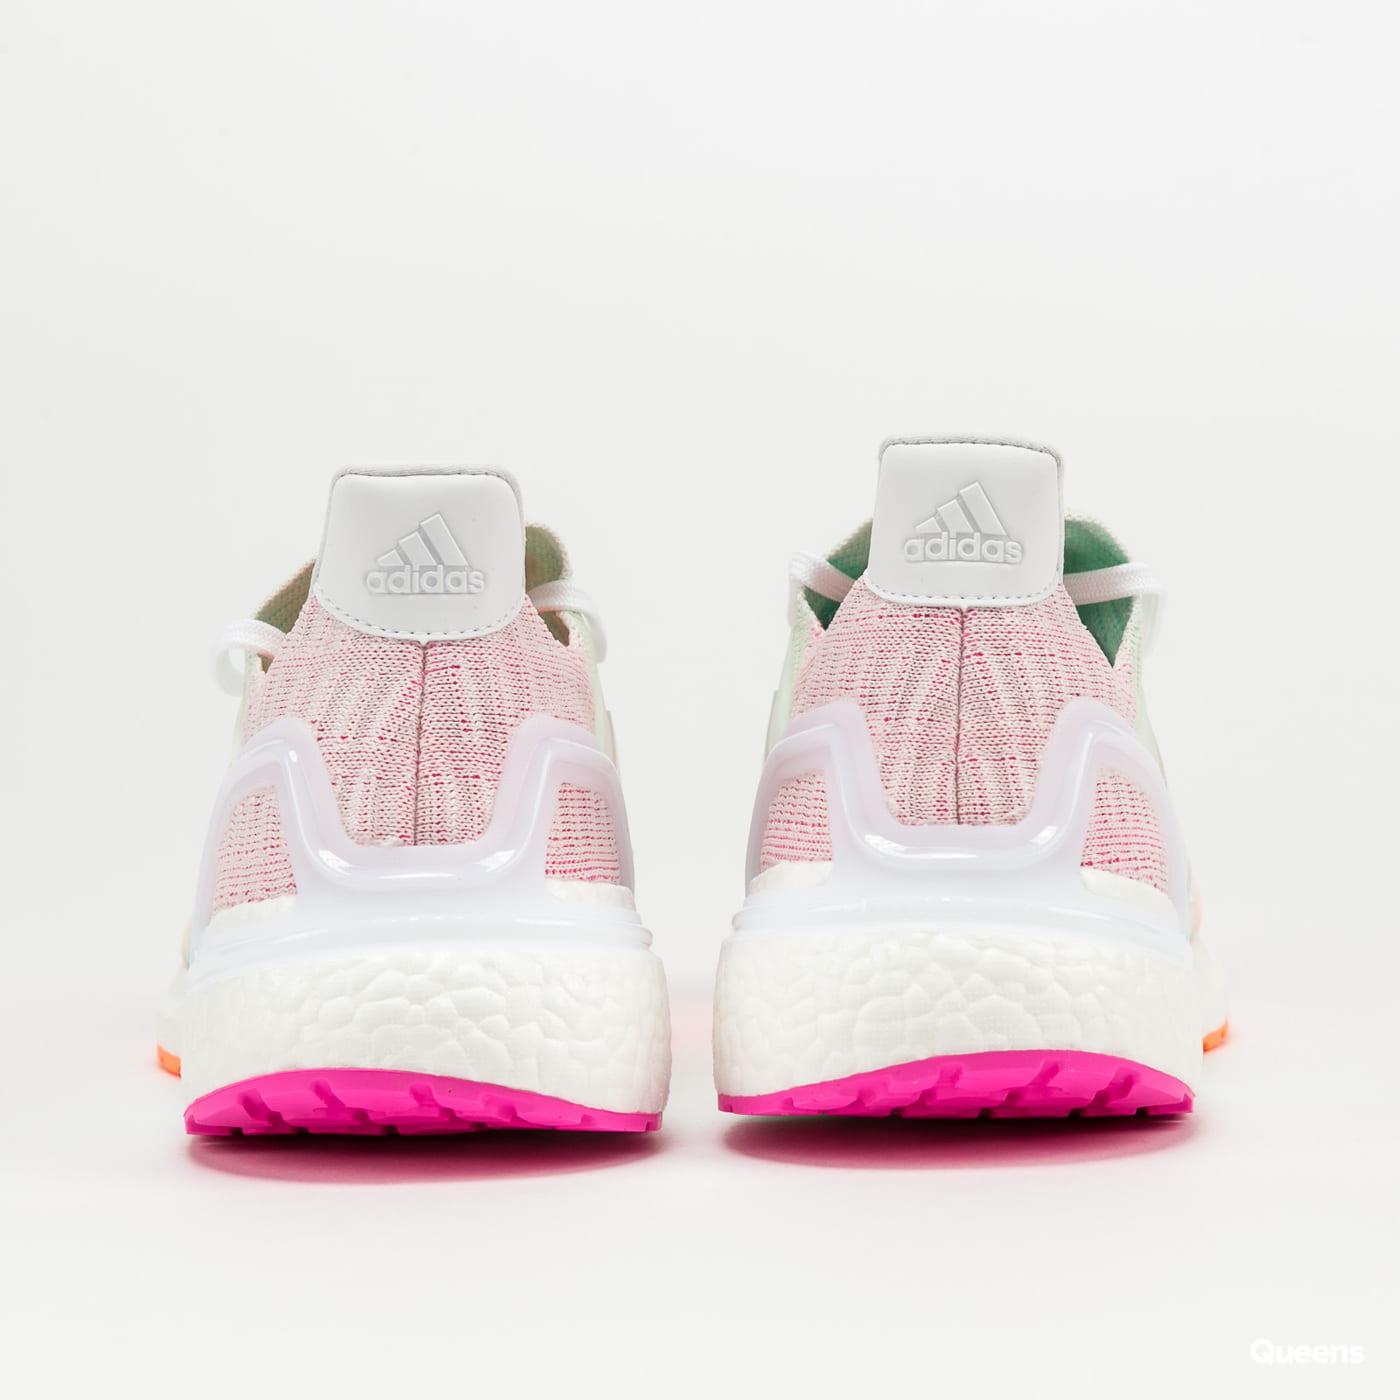 adidas Performance UltraBoost CC_1 DNA ftwwht / ftwwht / scrora